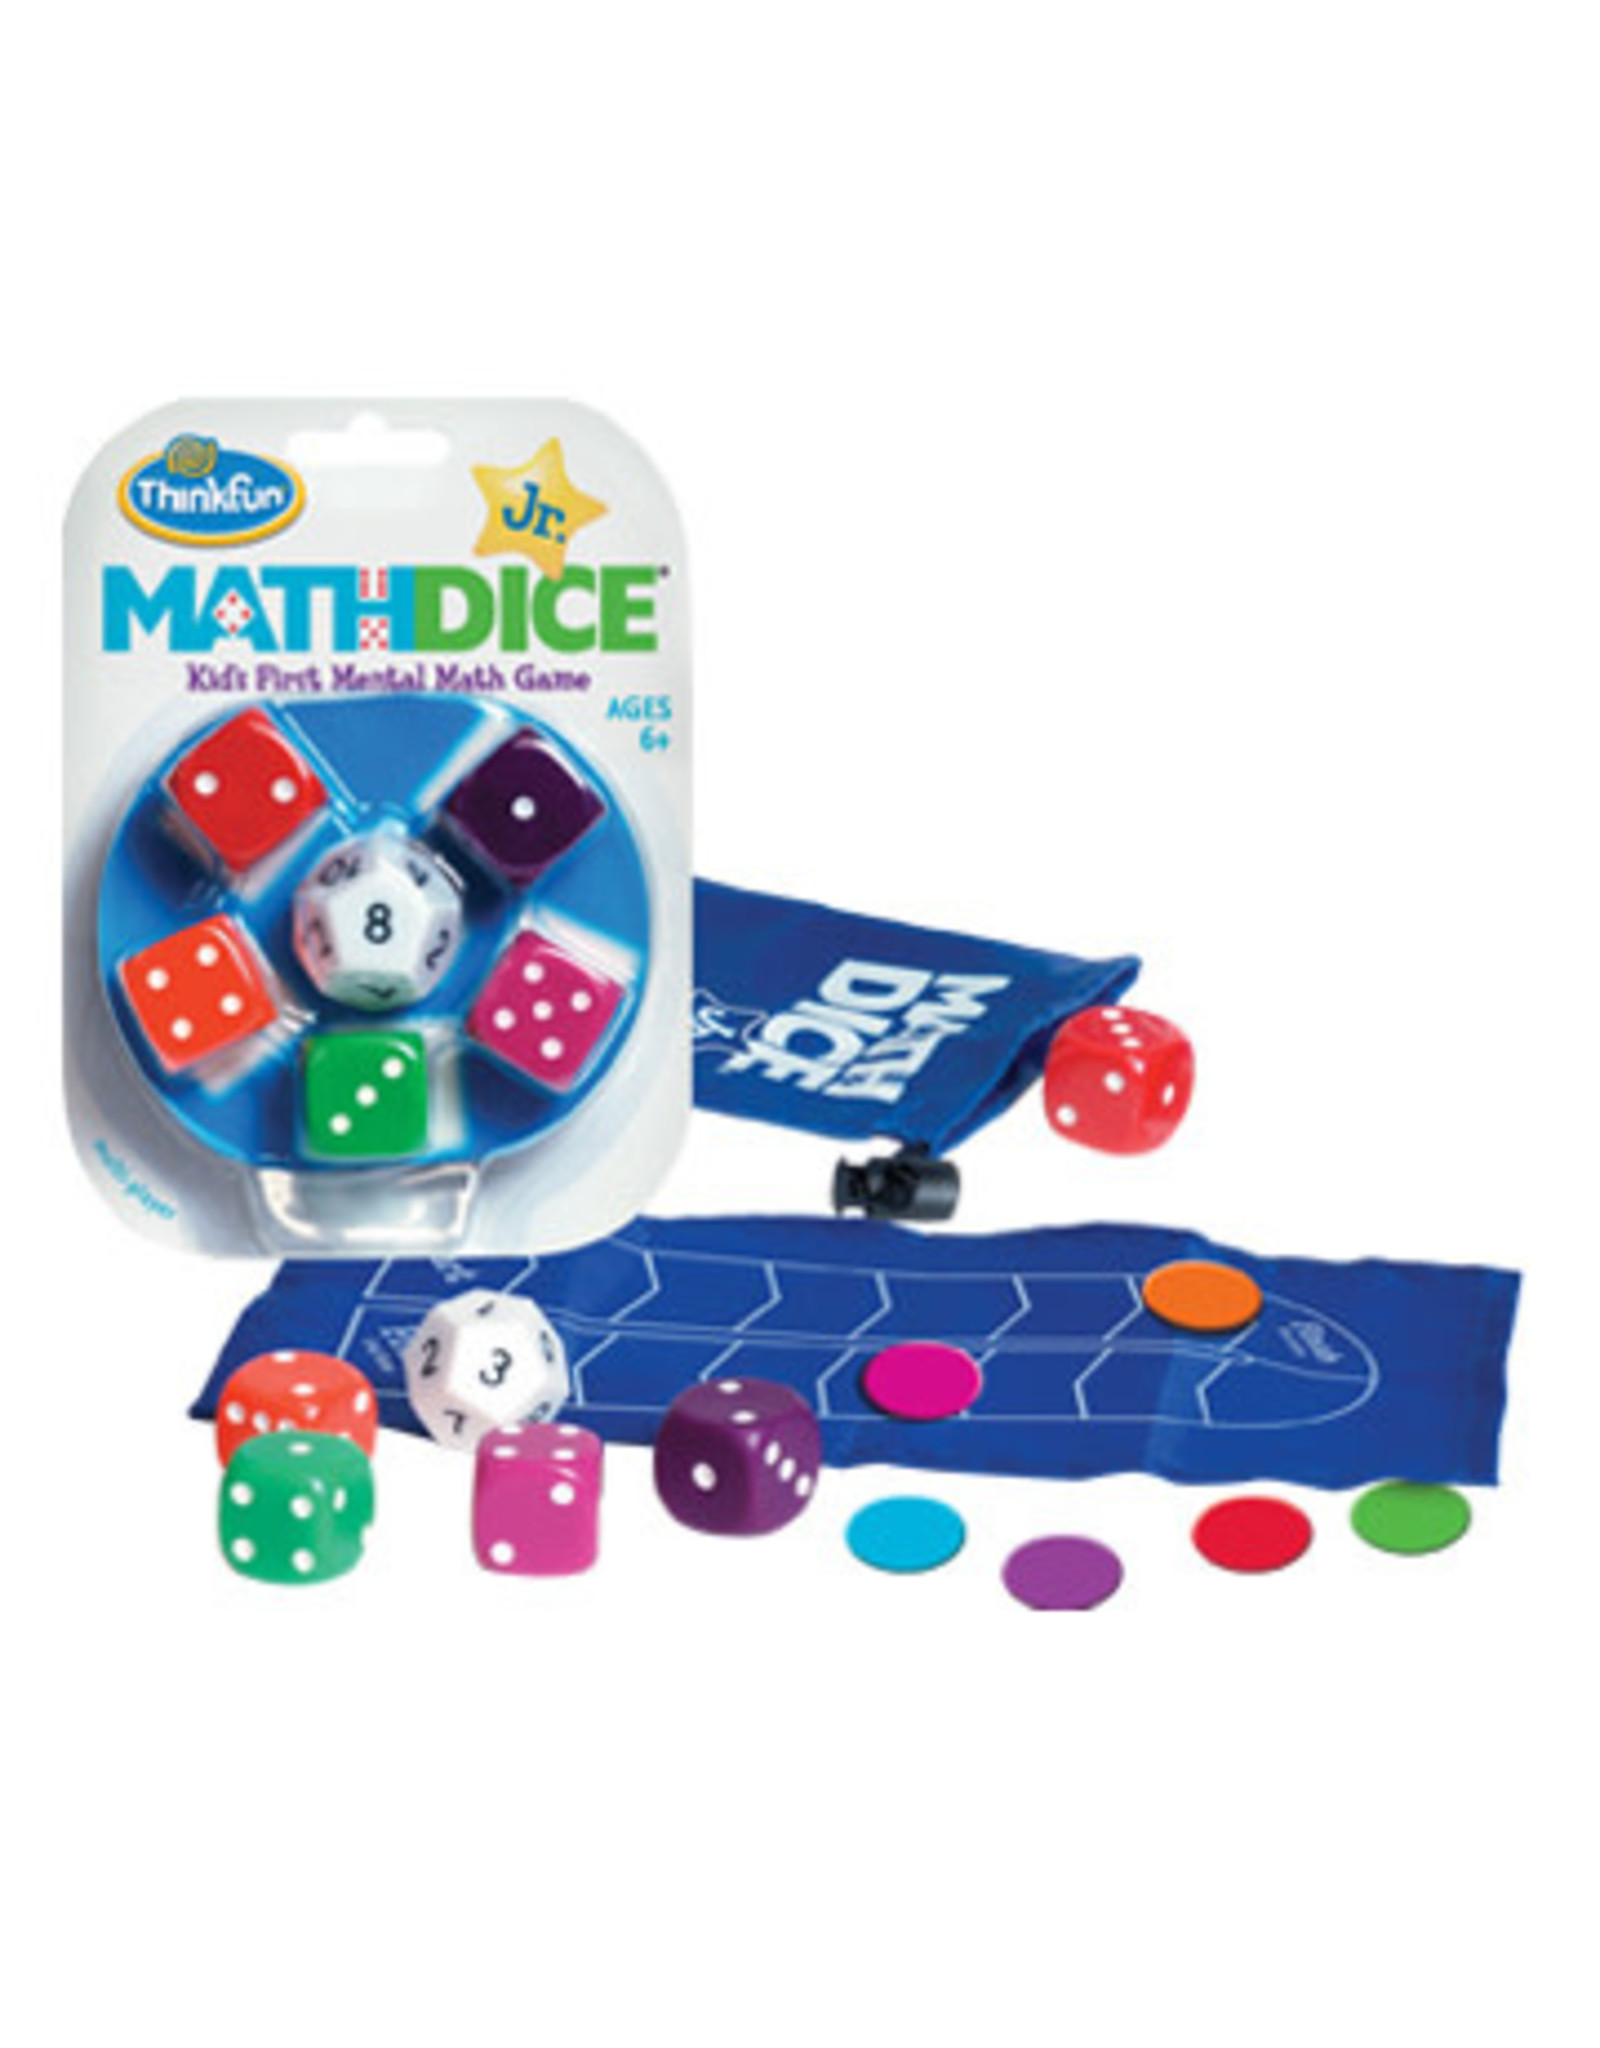 Think Fun Math Dice Jr. Game